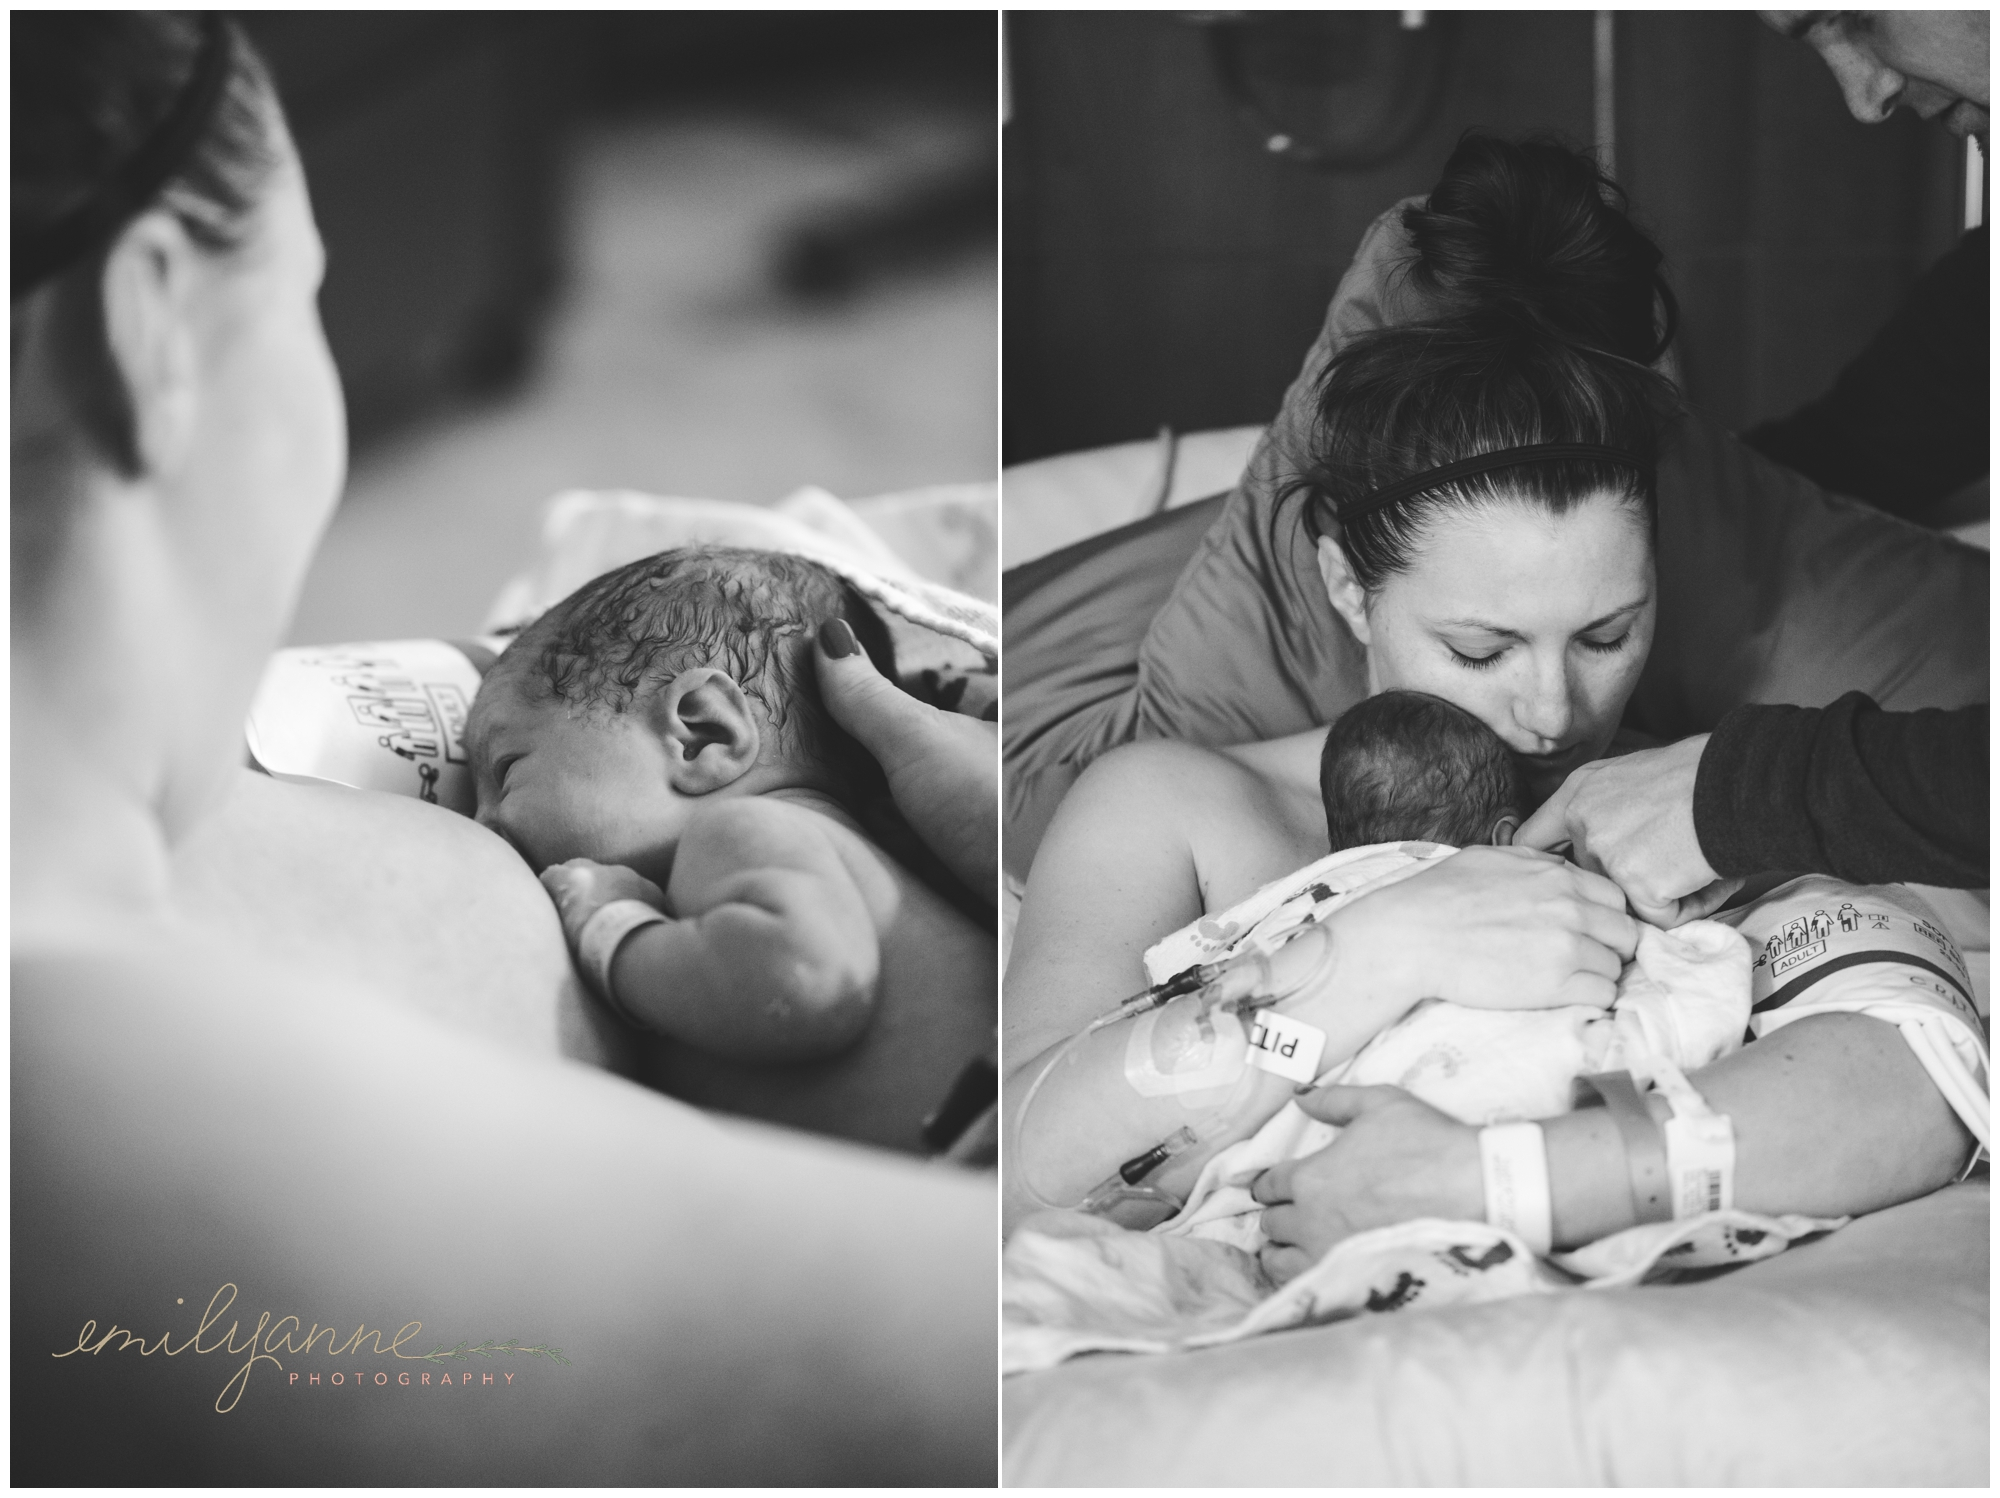 Denver Birth Photography | www.emilyanne-photography.com